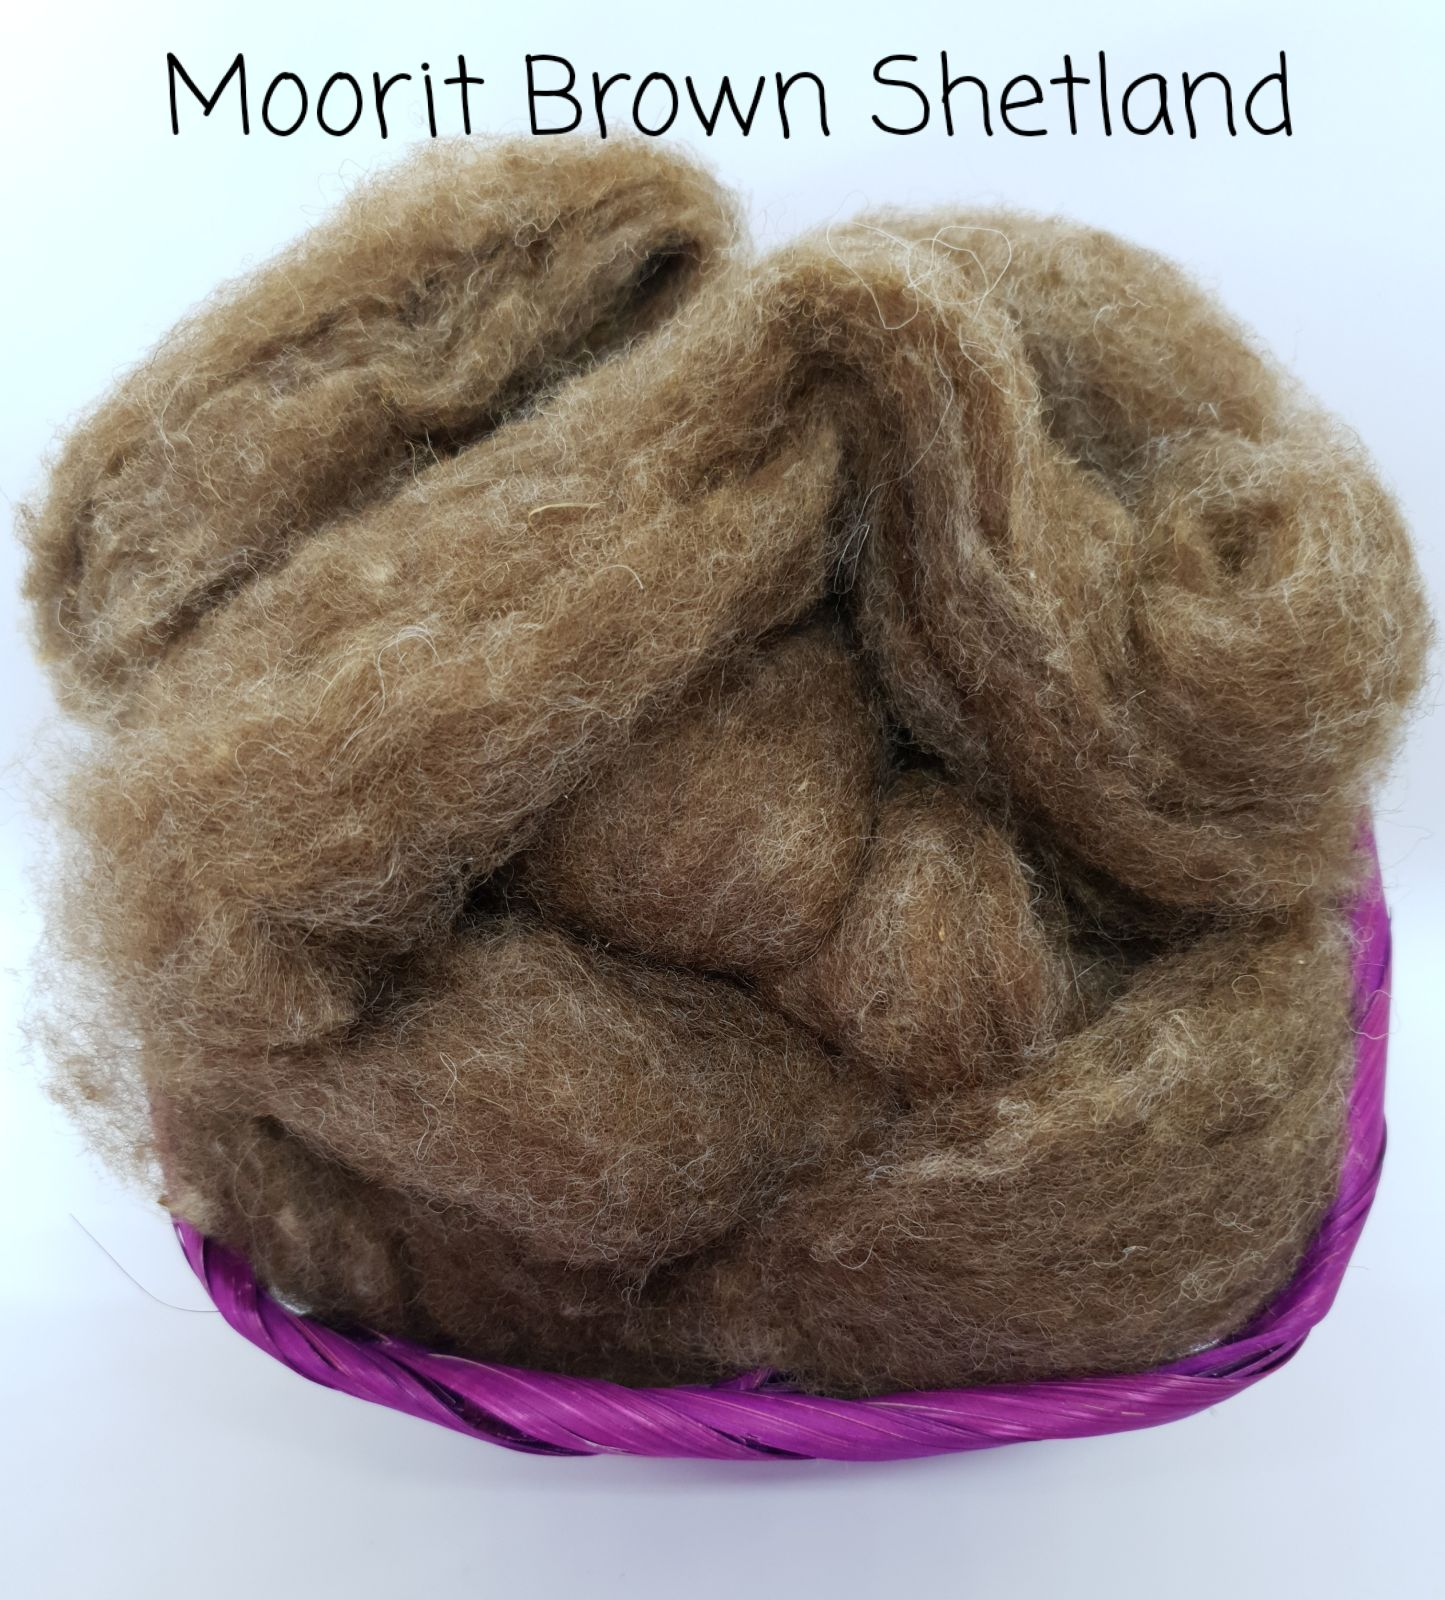 Moorit Brown Shetland Slither